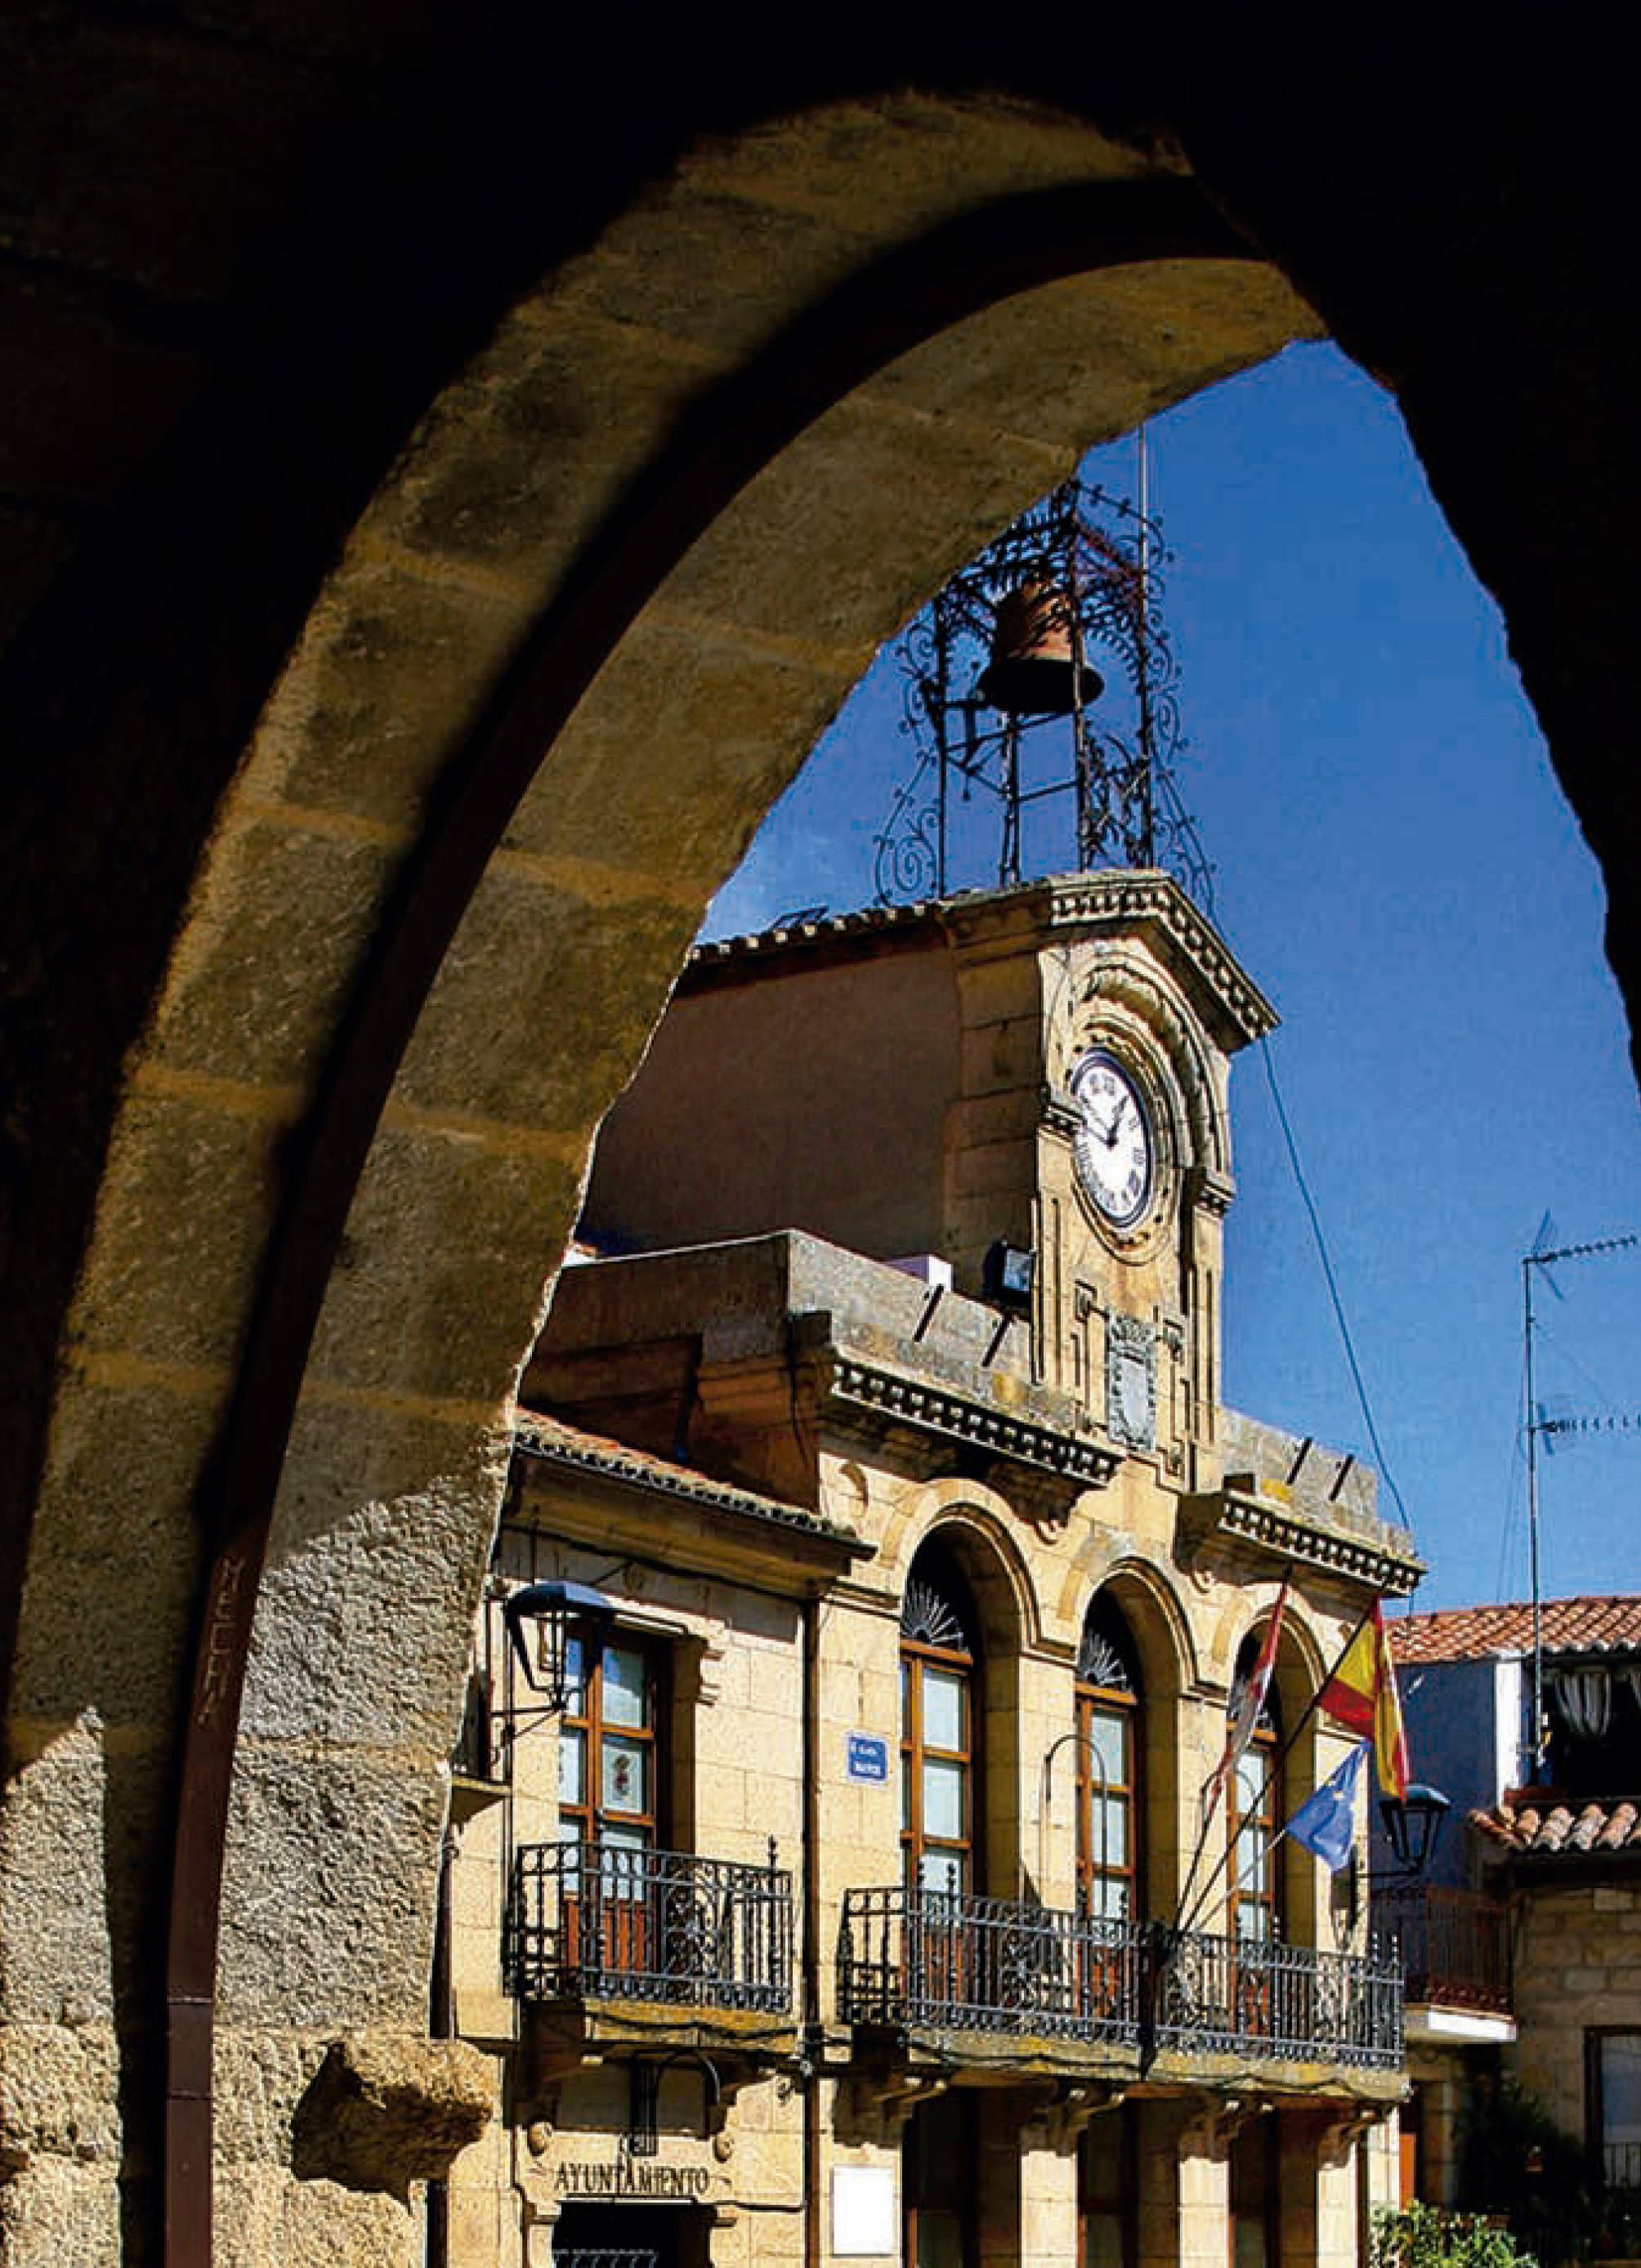 Programa de ferias y fiestas 2019 - Fermoselle (Zamora) 2